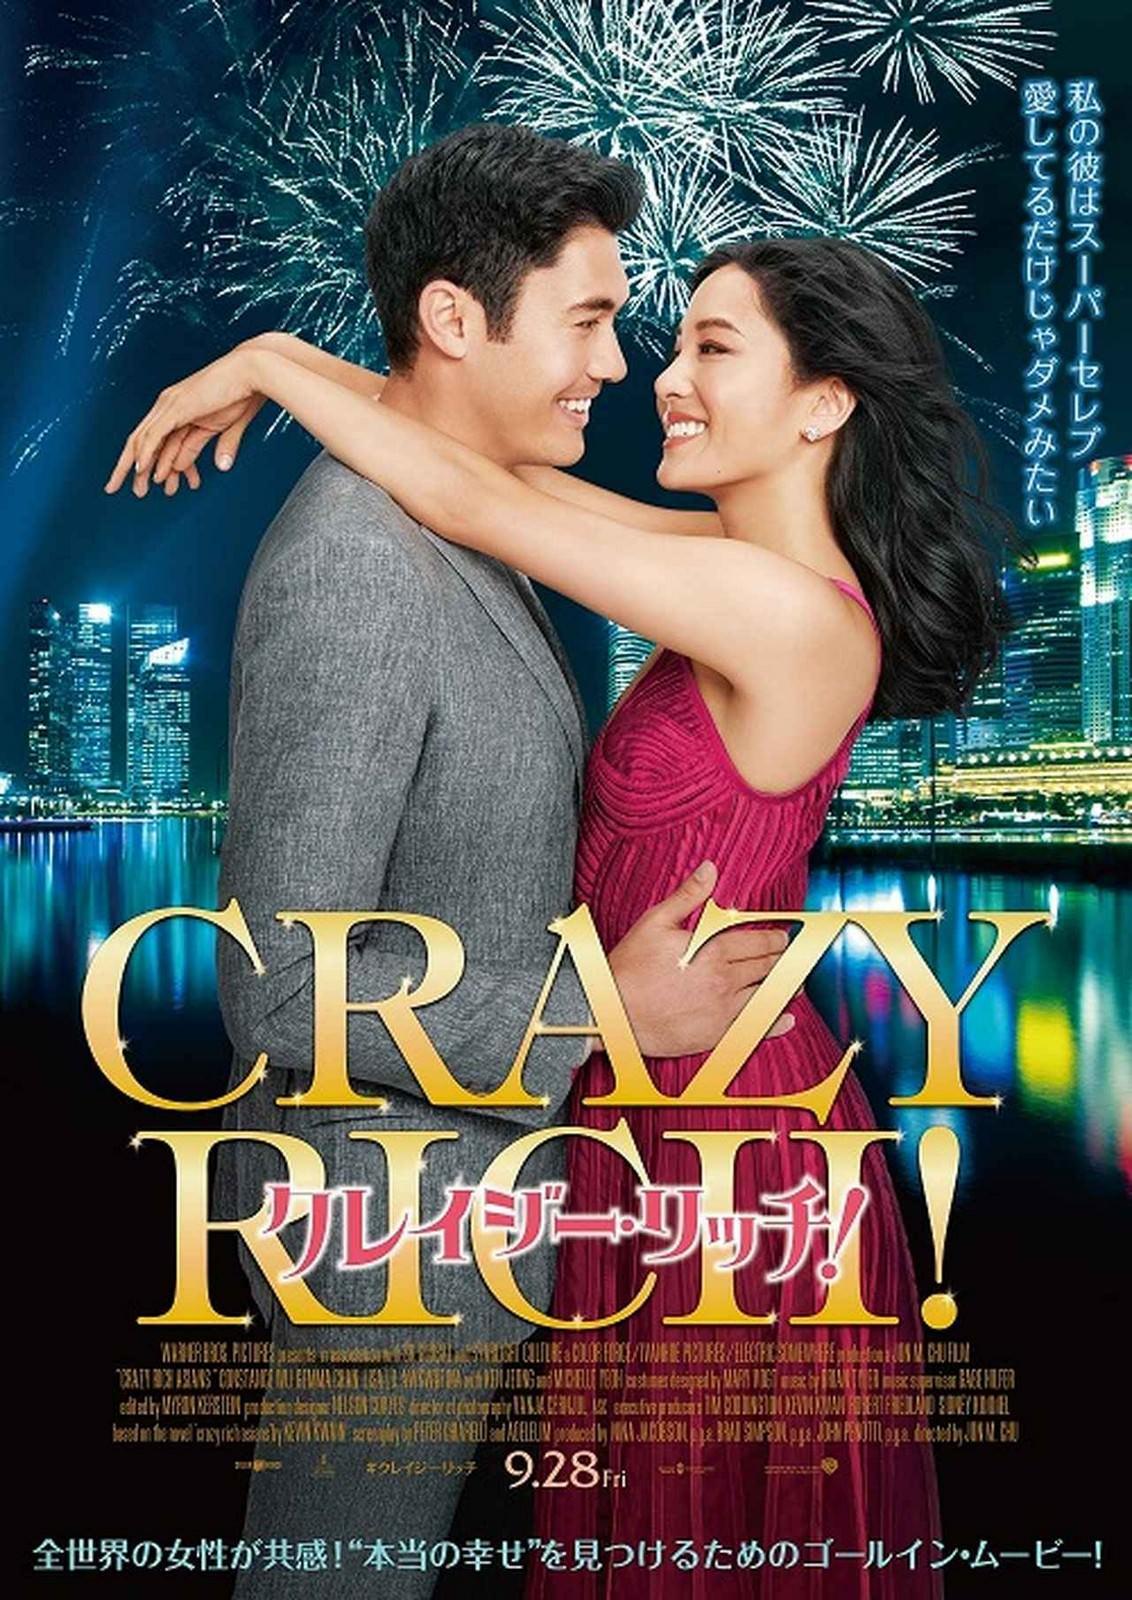 Movie, Crazy Rich Asians(美國, 2018) / 瘋狂亞洲富豪(台) / 我的超豪男友(港) / 摘金奇缘(網), 電影海報, 日本